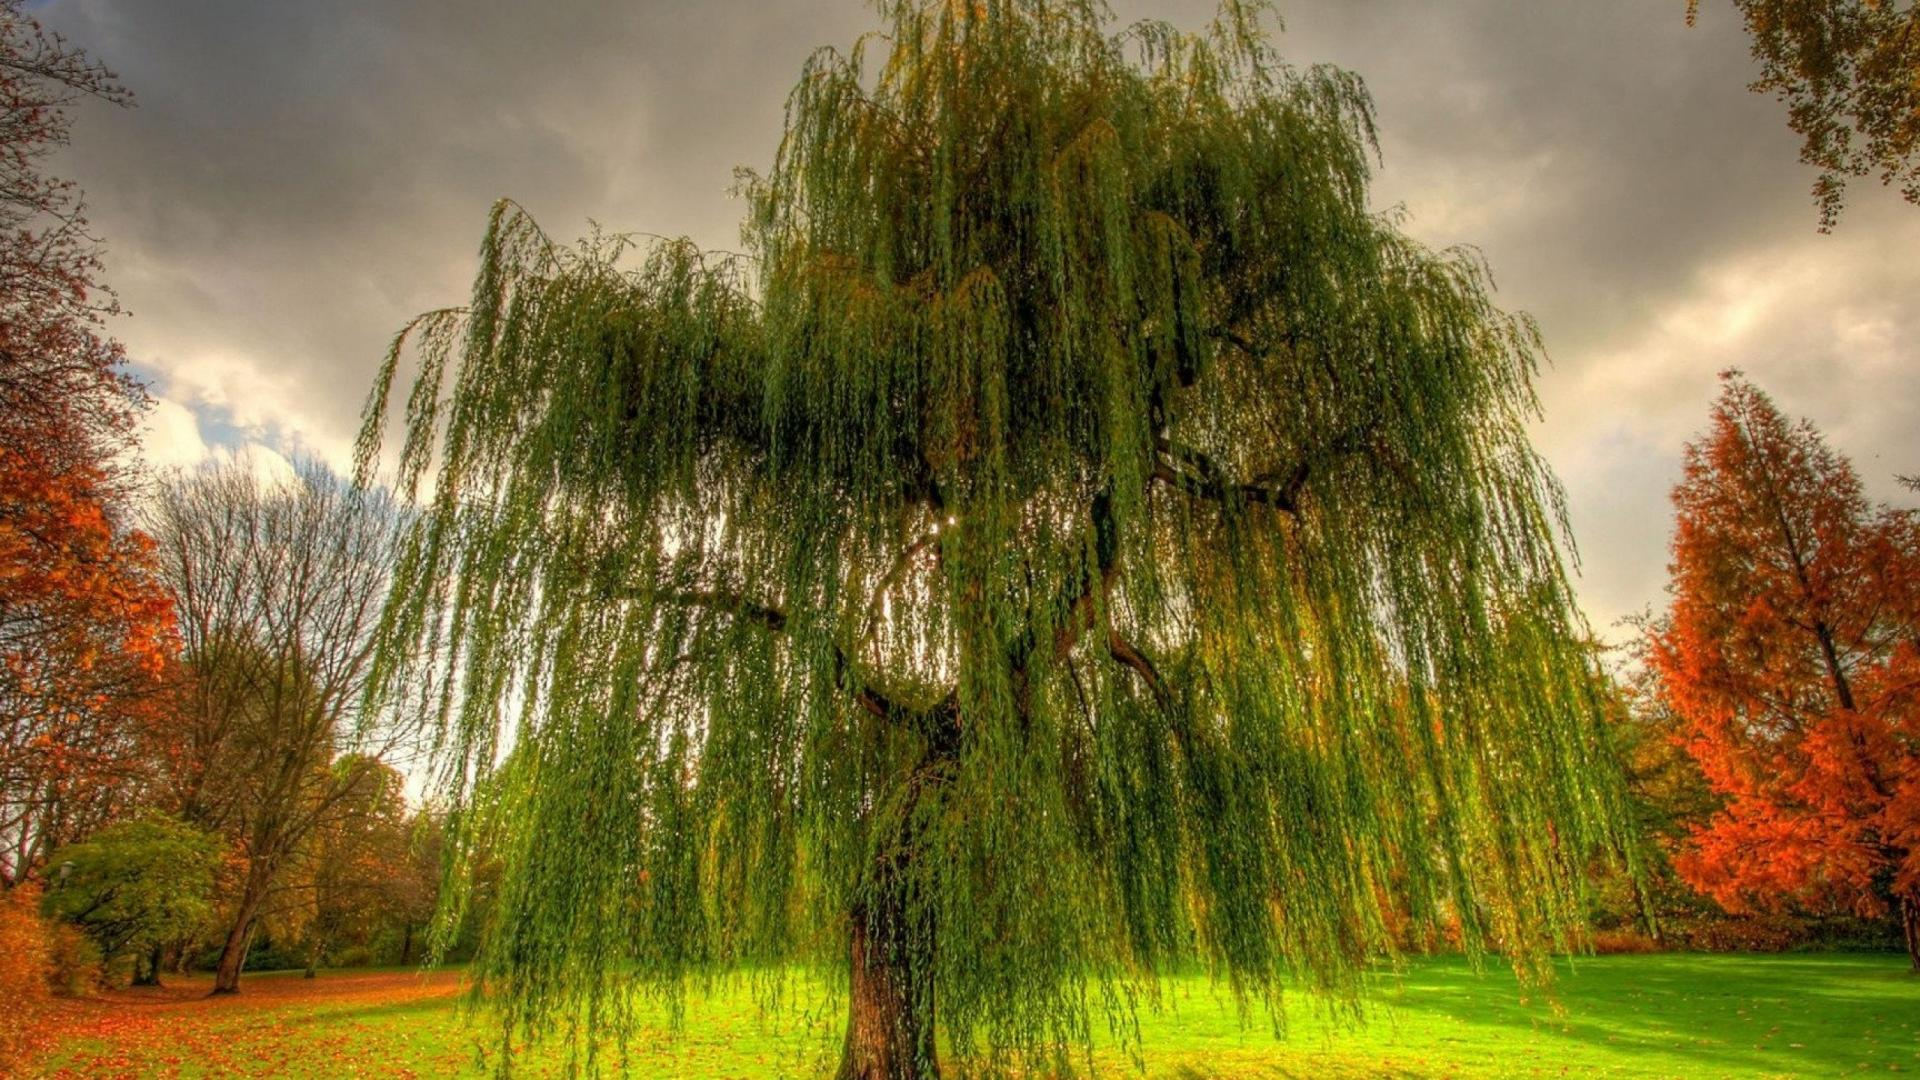 pretty tree weeping willow willow wallpaper Desktop HD Wallpaper 1920x1080